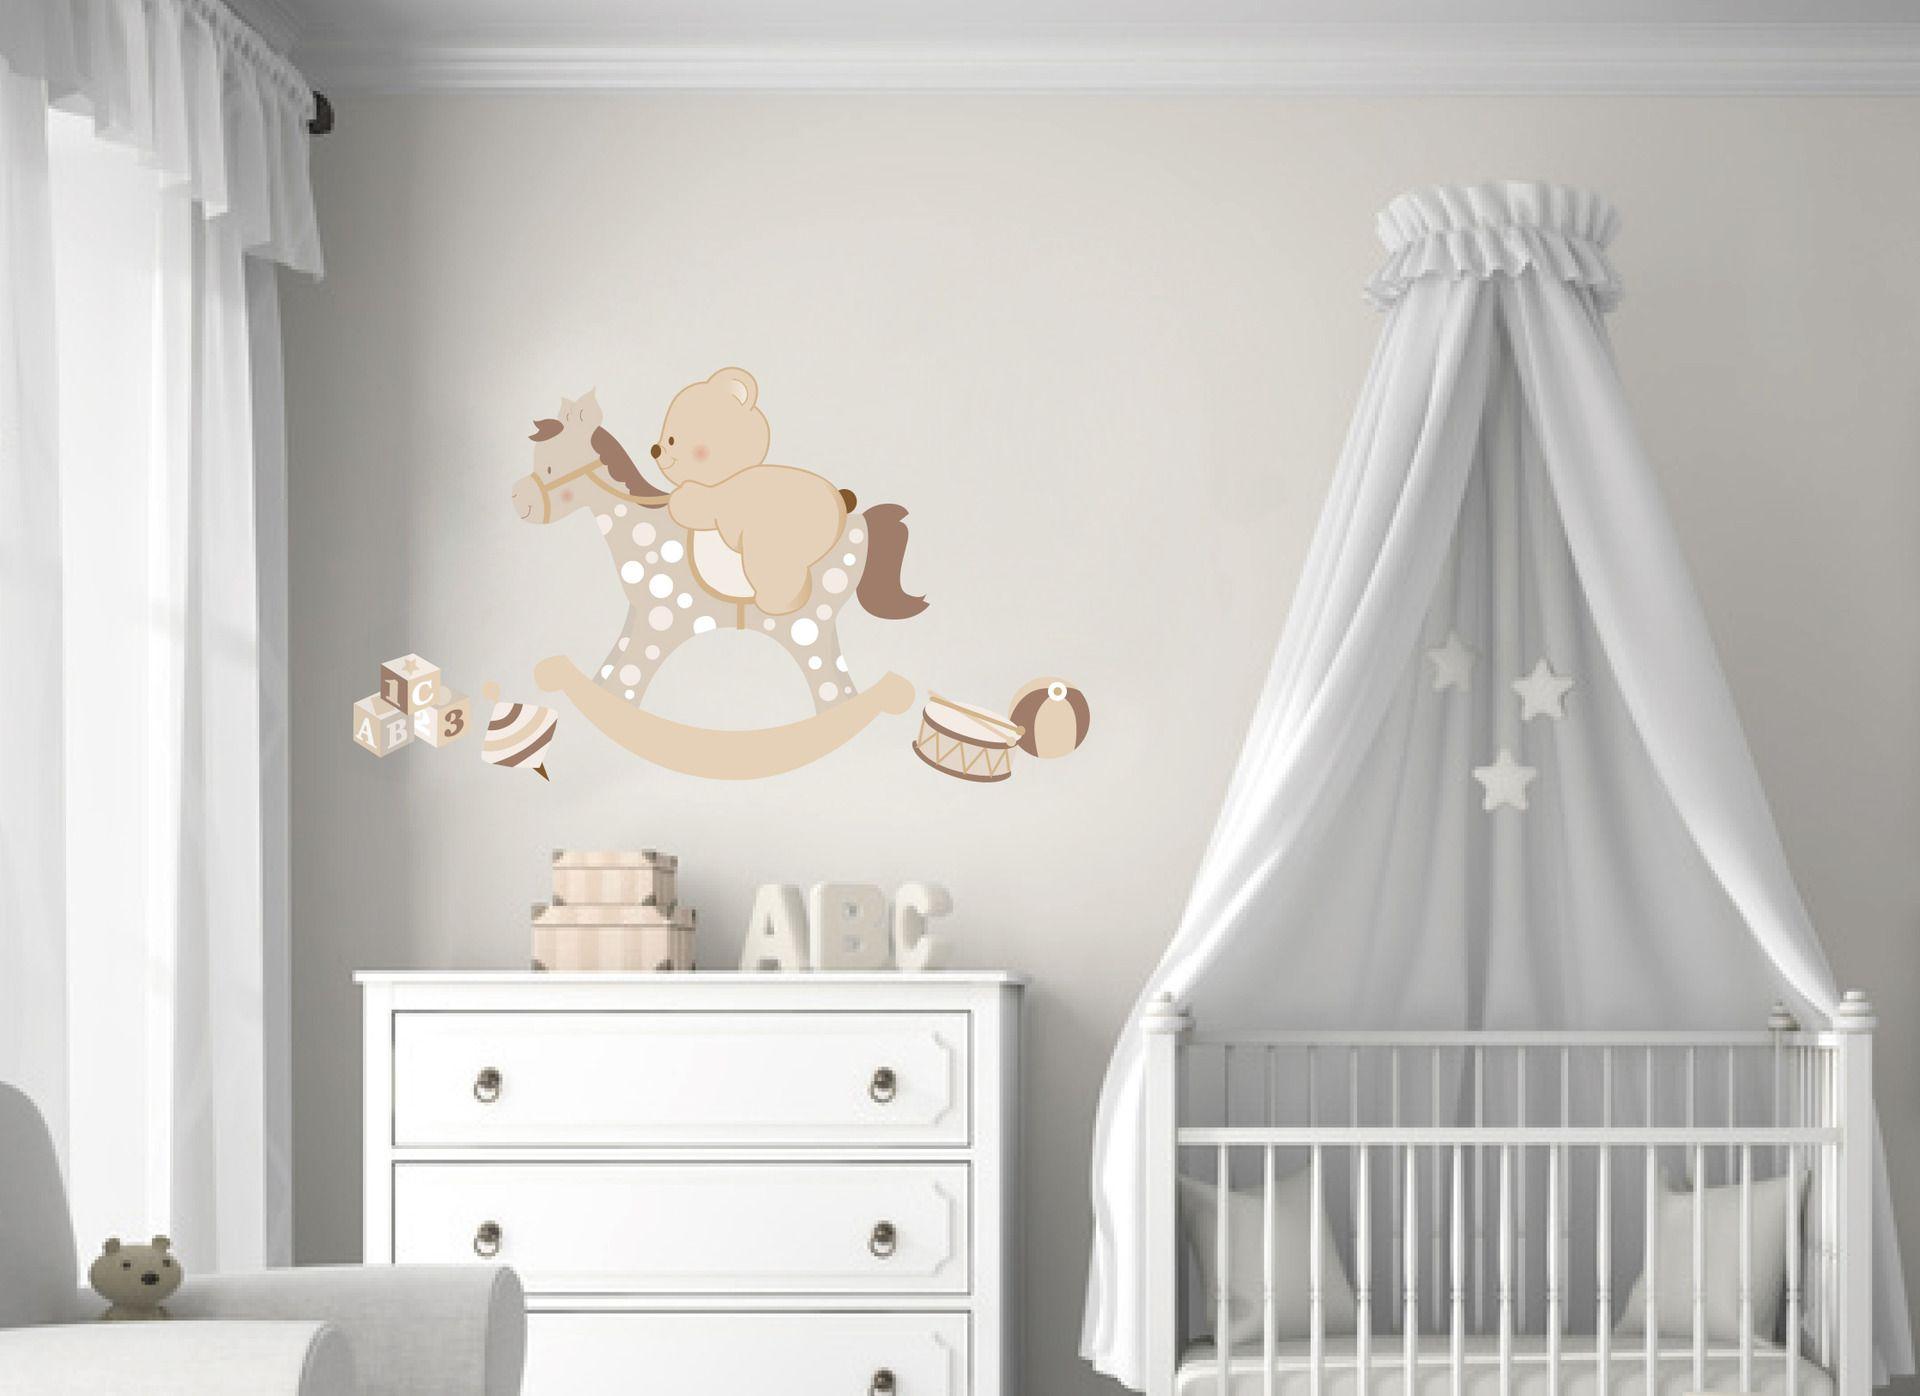 Cameretta Bebè ~ Dipingere cameretta bambino affordable perfect idee per camere